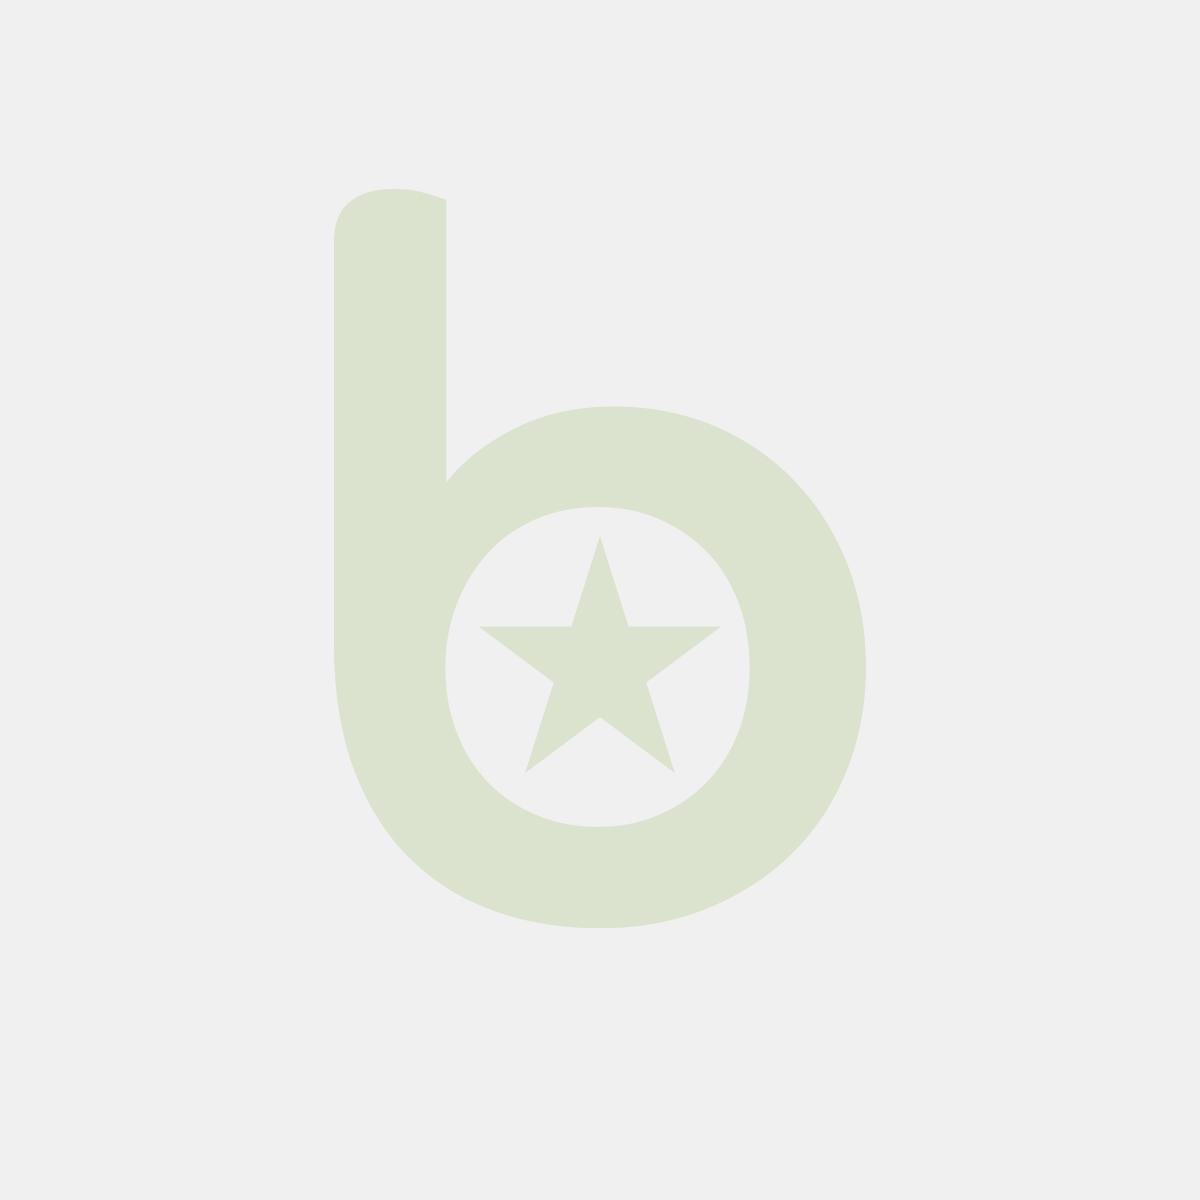 Serwetki PAPSTAR Royal Collection ORNAMENTS 40x40 c.zieleń opakowanie 50szt